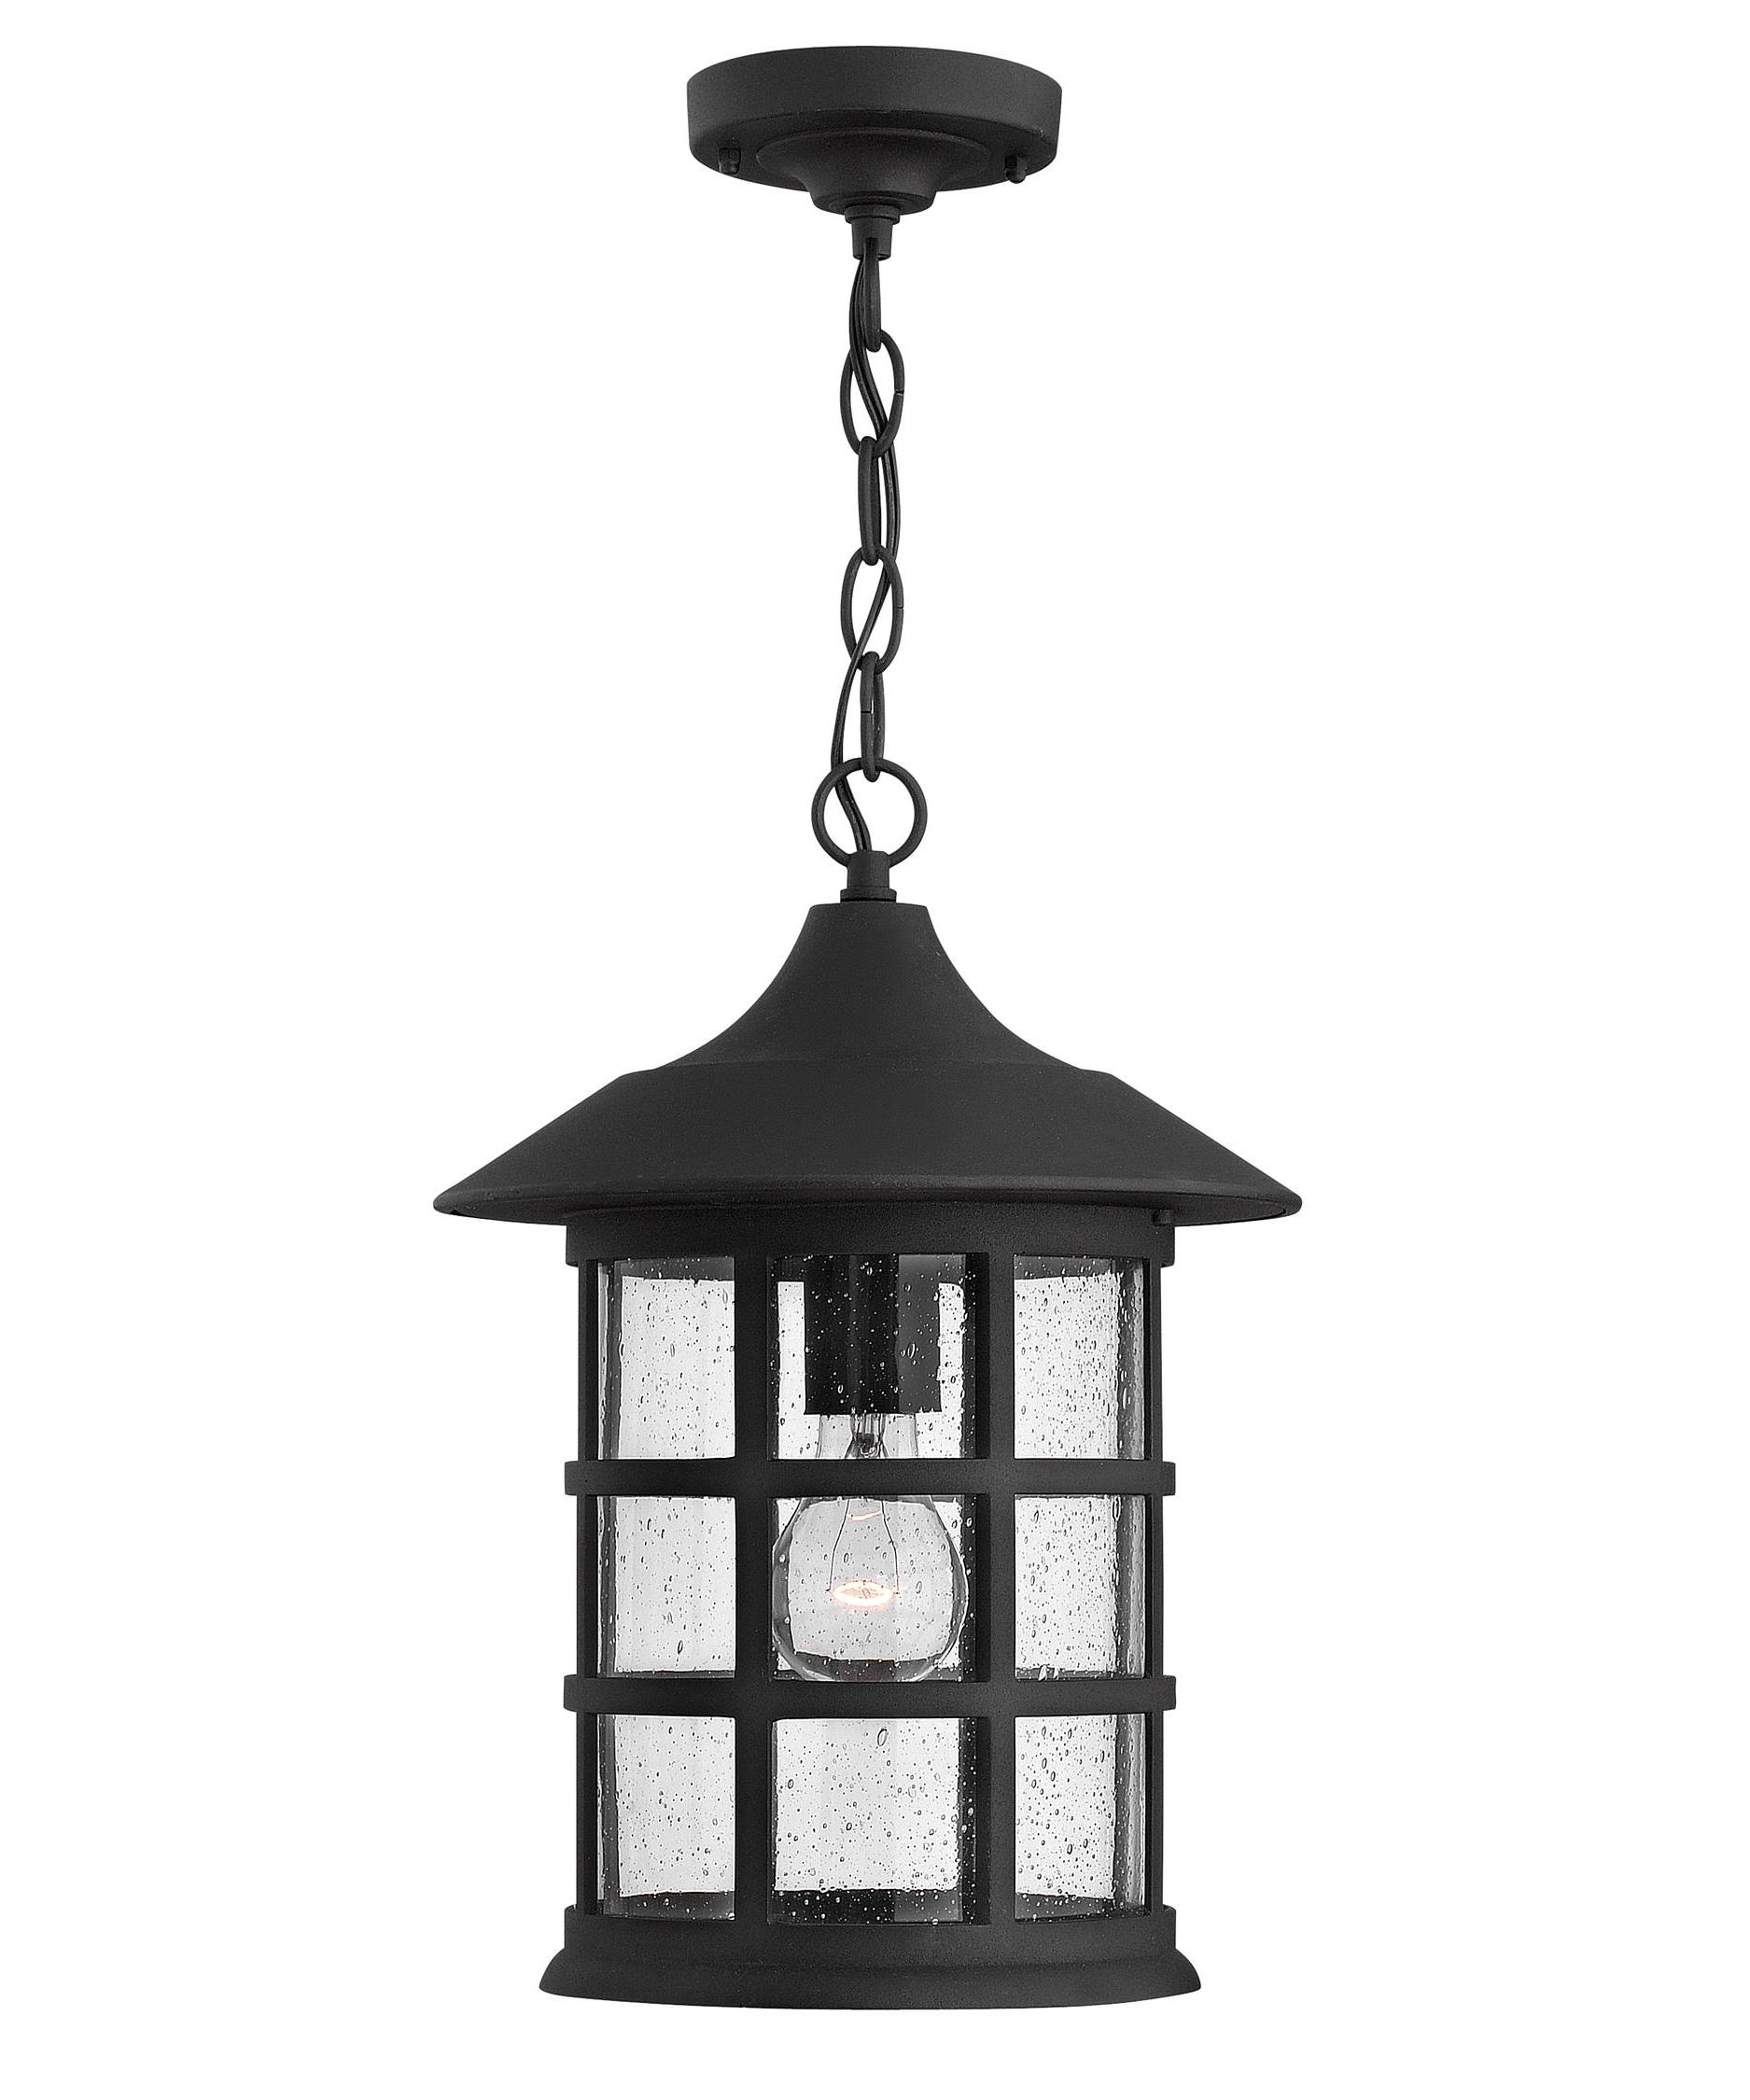 Hinkley Lighting 1802 Freeport 10 Inch Wide 1 Light Outdoor Hanging Inside Favorite Hinkley Outdoor Hanging Lights (View 3 of 20)